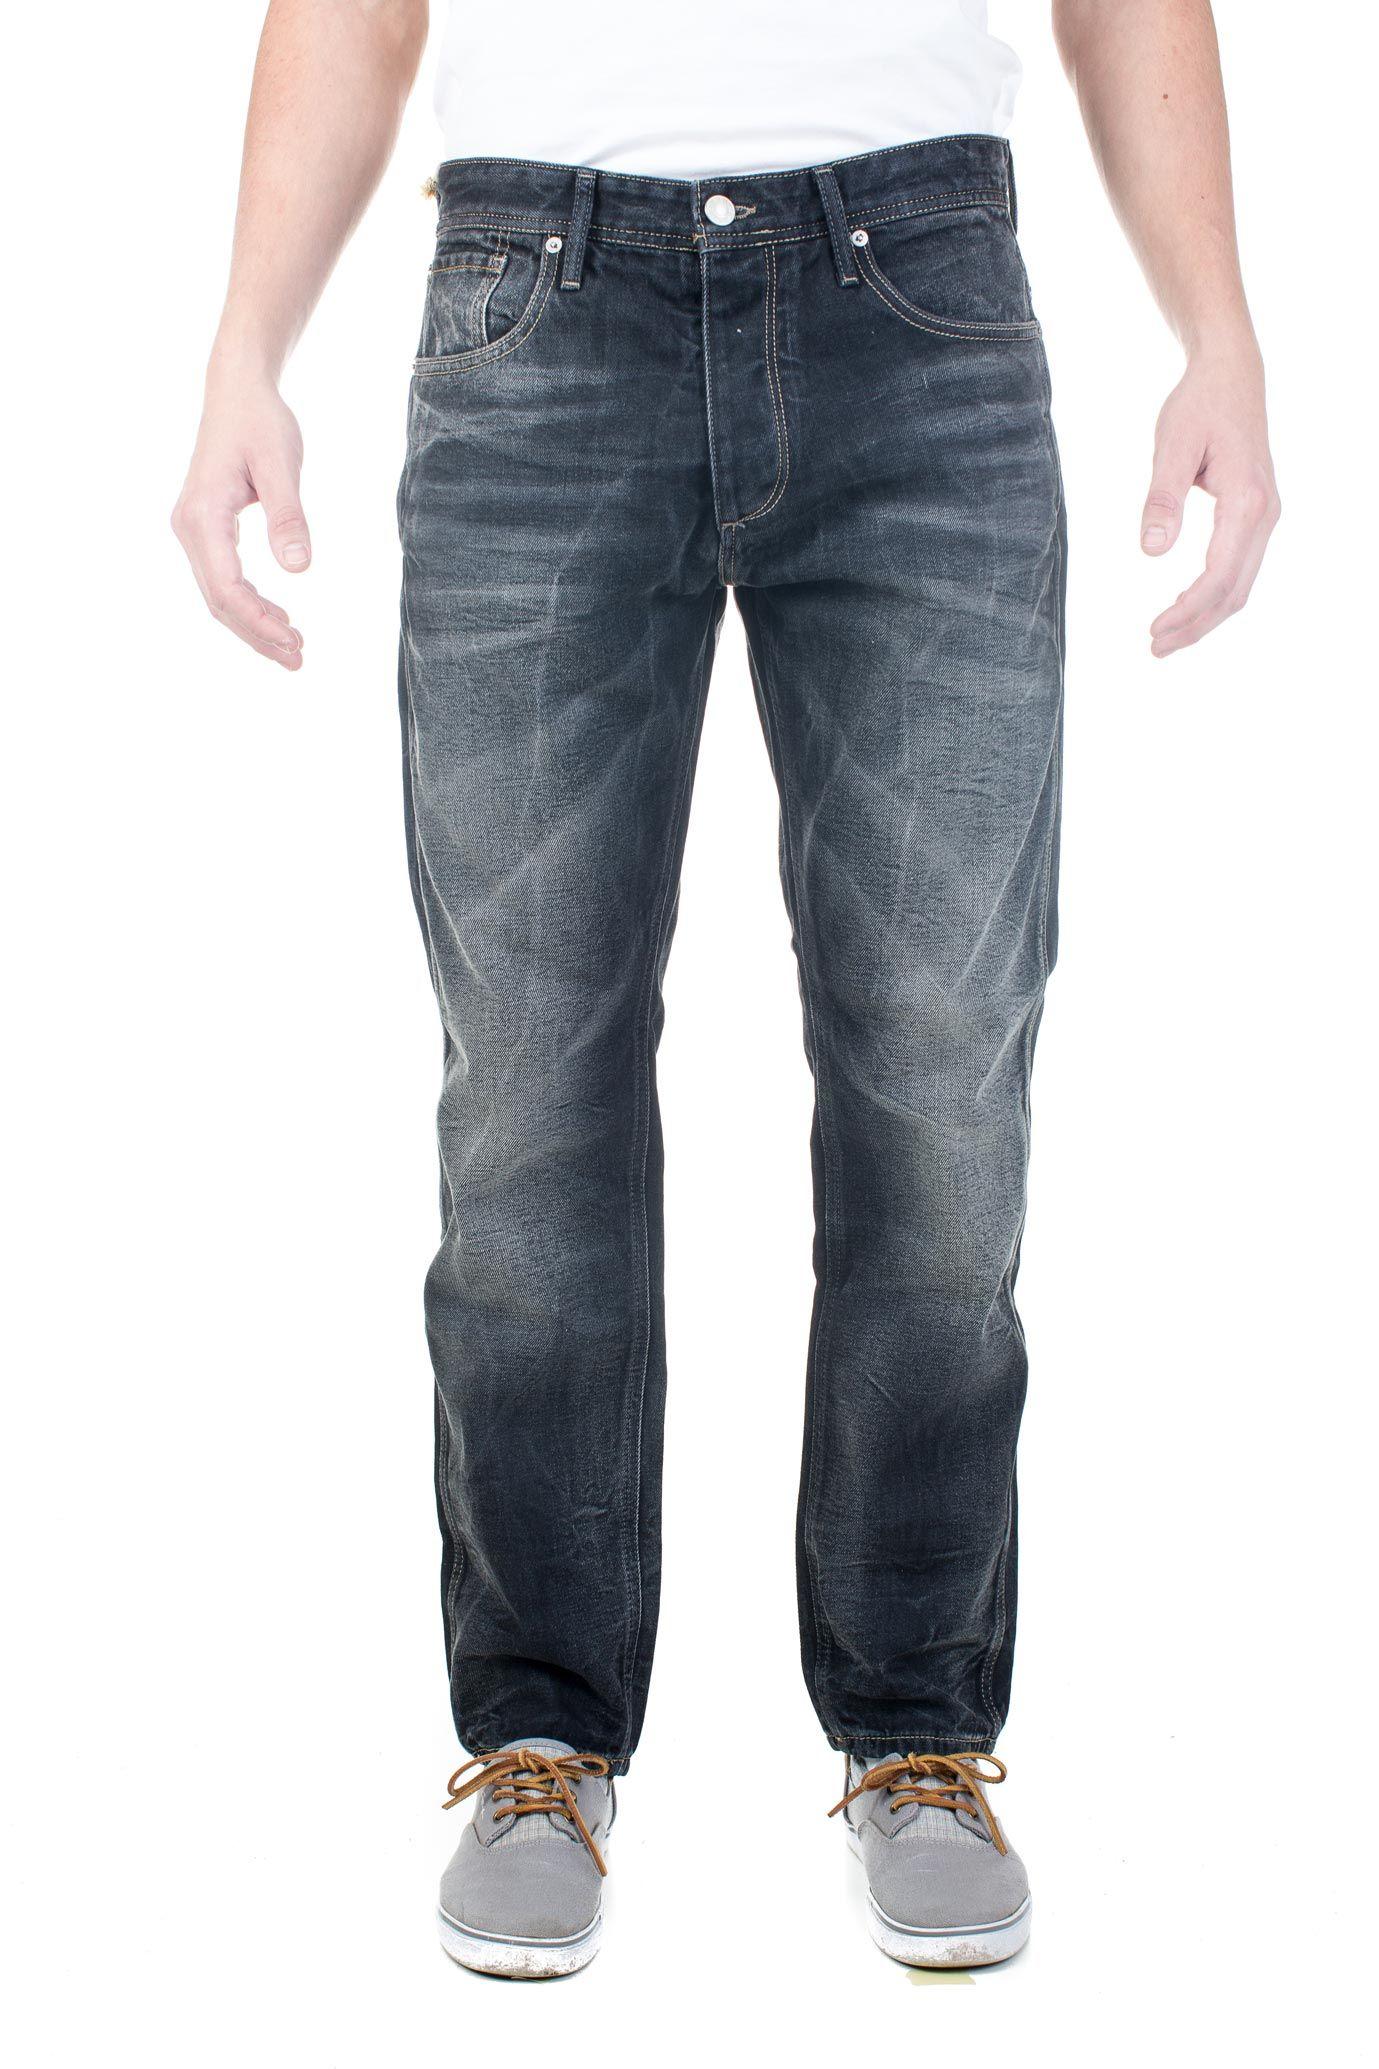 Jack and Jones Erik Original JJ 738 Jeans